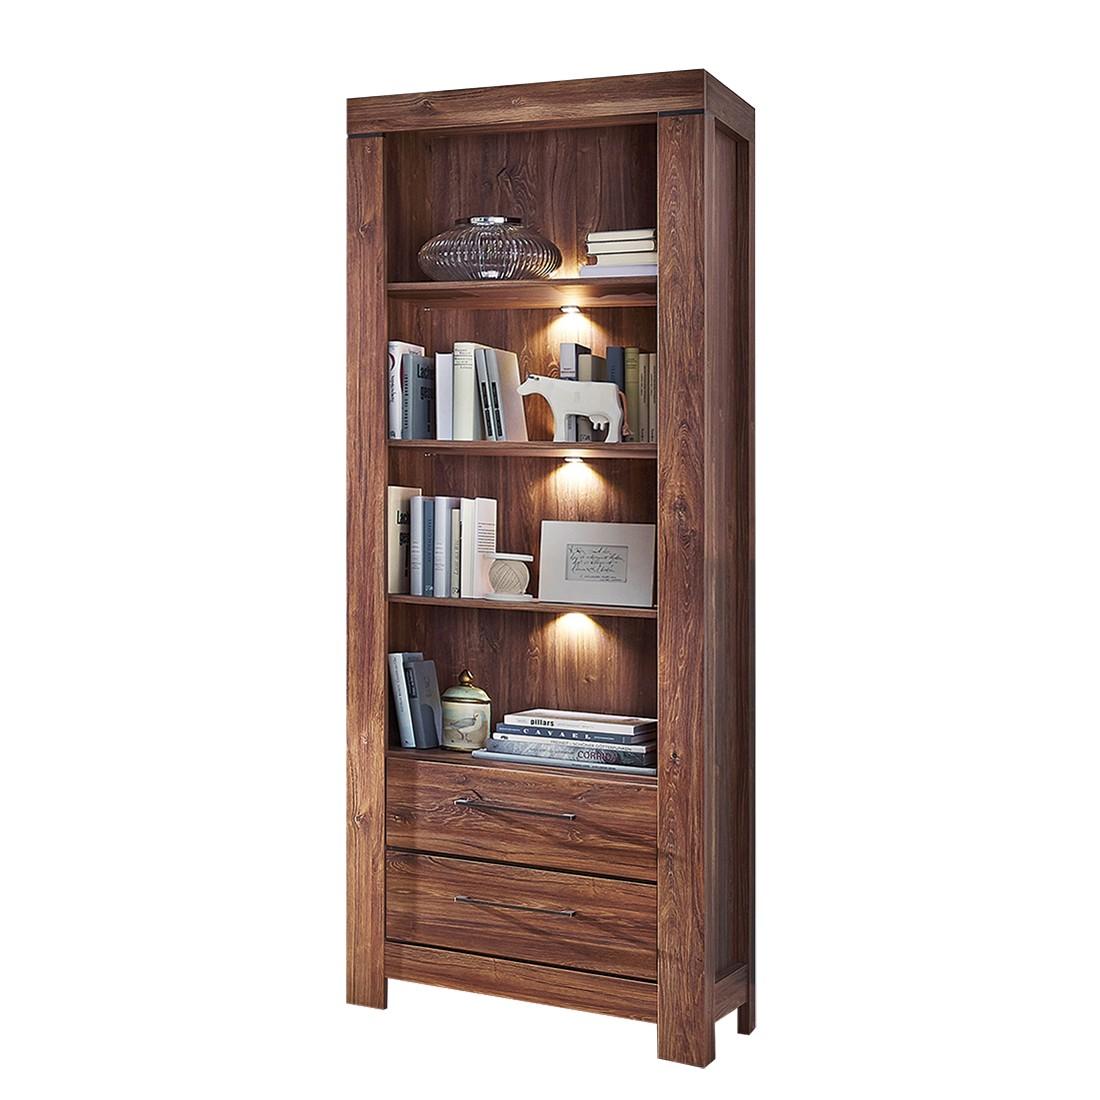 regal mit led beleuchtung cheap glasregale mit led beleuchtung glasregal badezimmer engaging. Black Bedroom Furniture Sets. Home Design Ideas